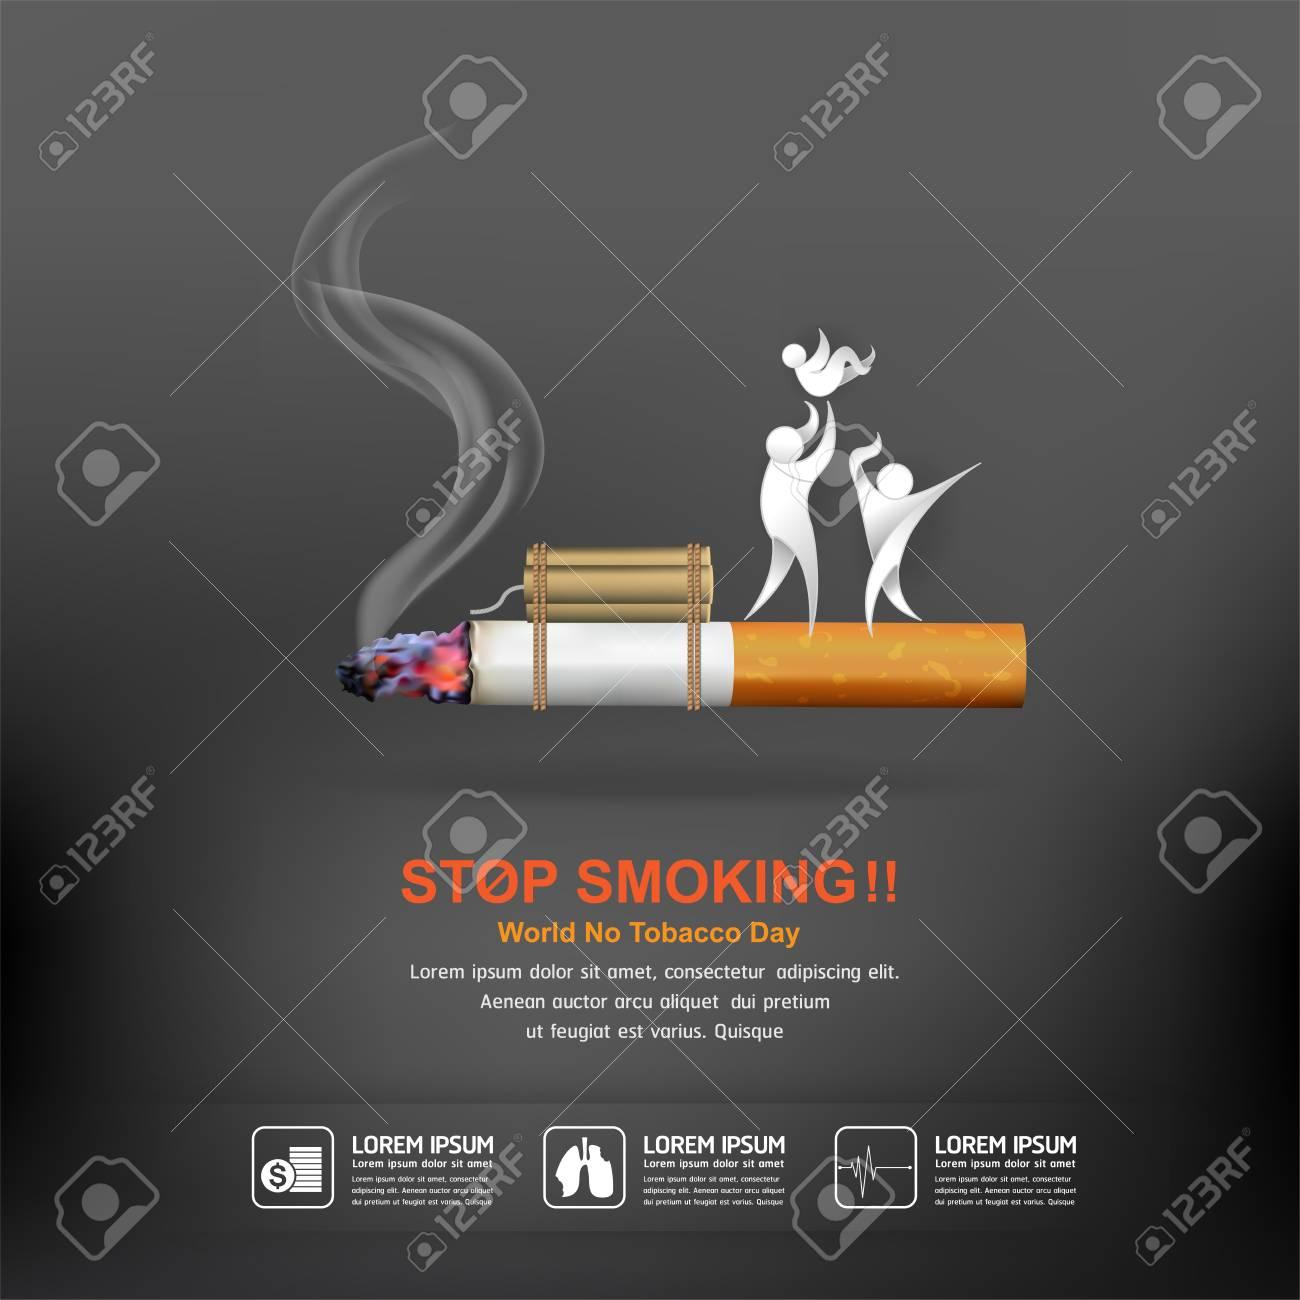 World No Tobacco Day Vector Concept Poster Stop Smoking Template. - 87702367